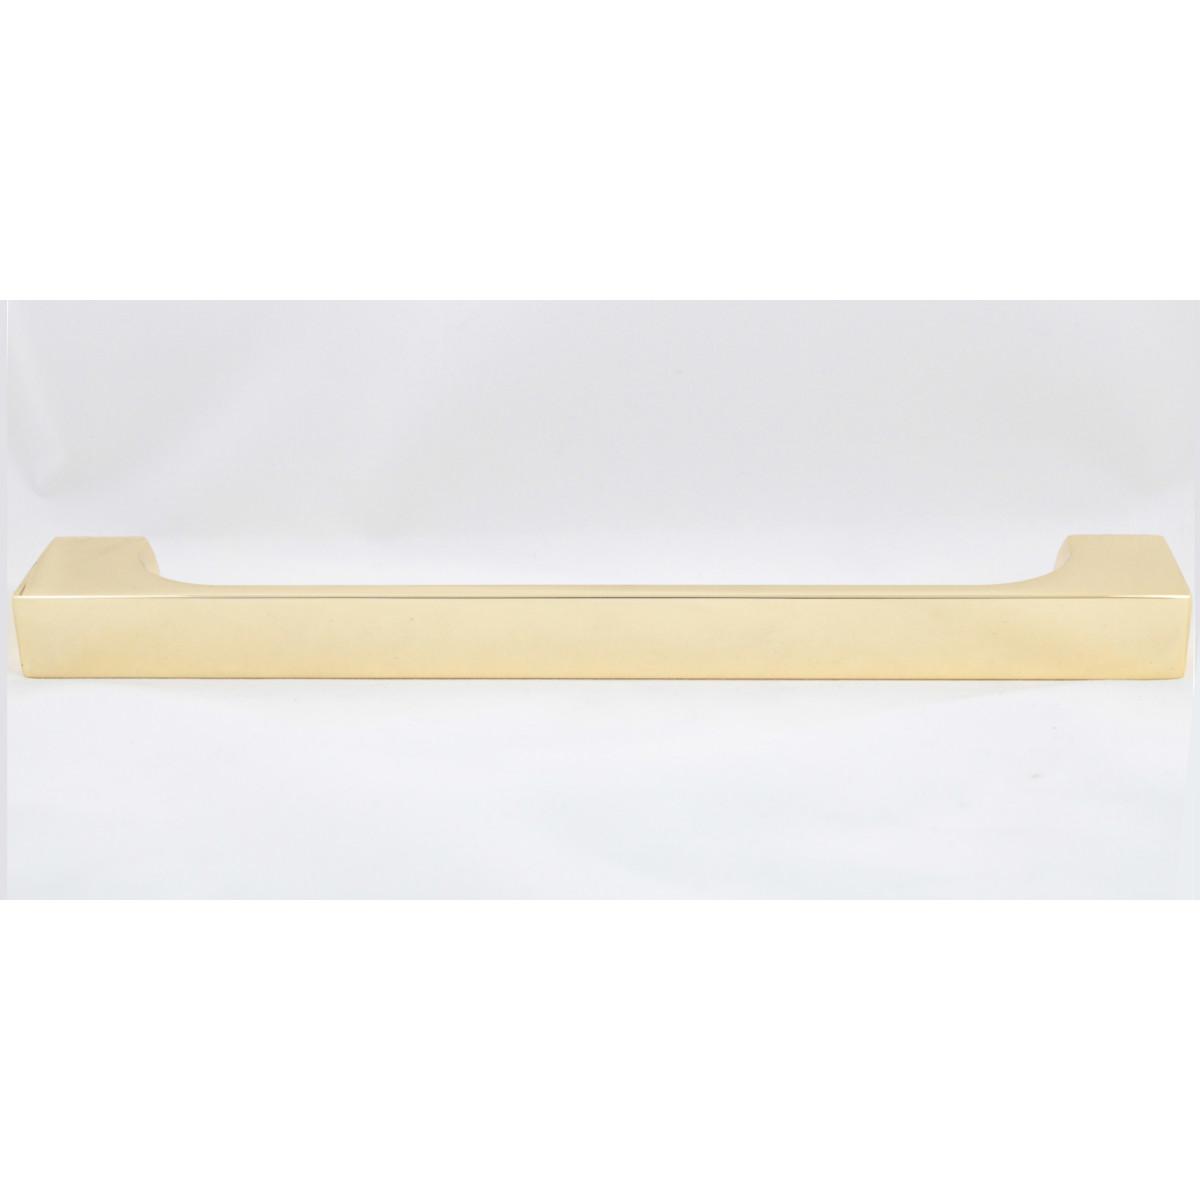 Ручка-Скоба Modda 320 Латунь Золото Pizza-830-09-320